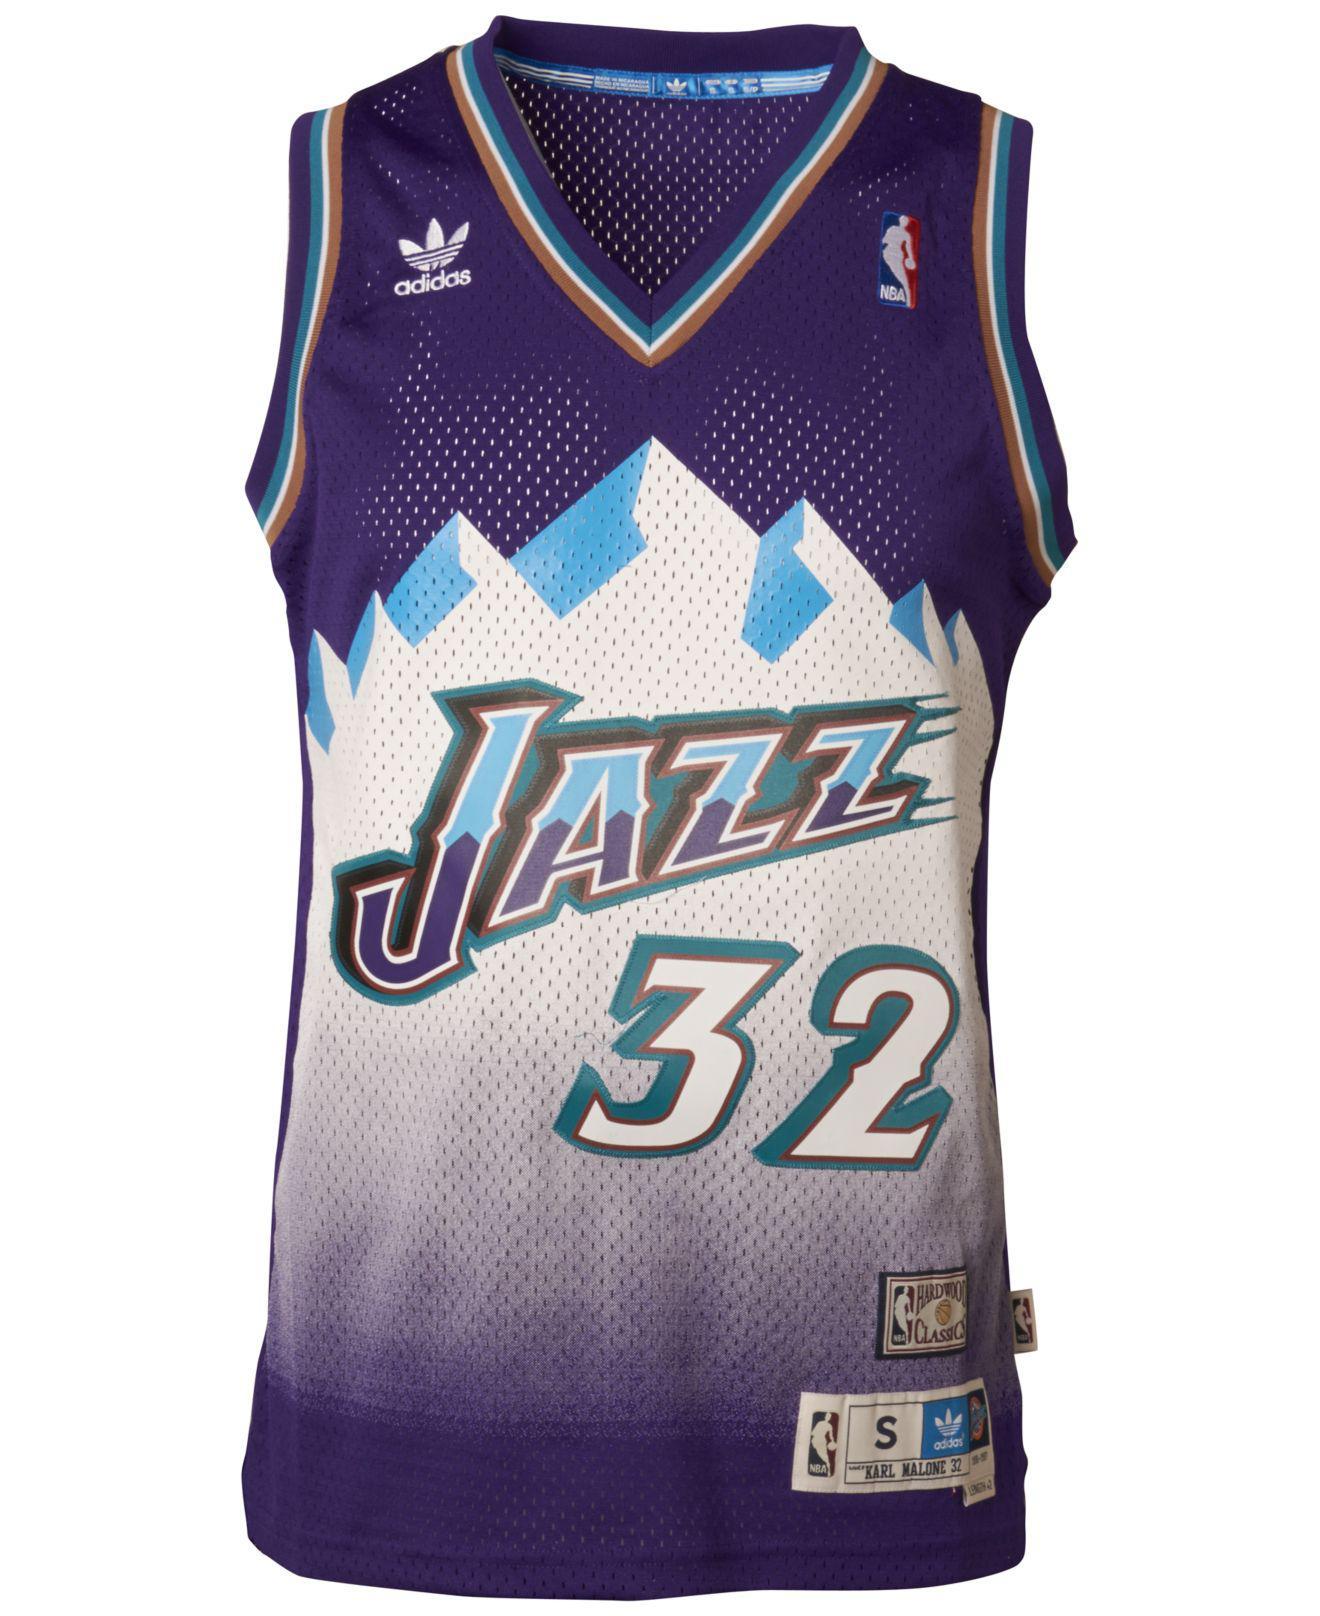 9273f5bdc8f Adidas - Purple Men s Karl Malone Utah Jazz Swingman Jersey for Men - Lyst.  View fullscreen